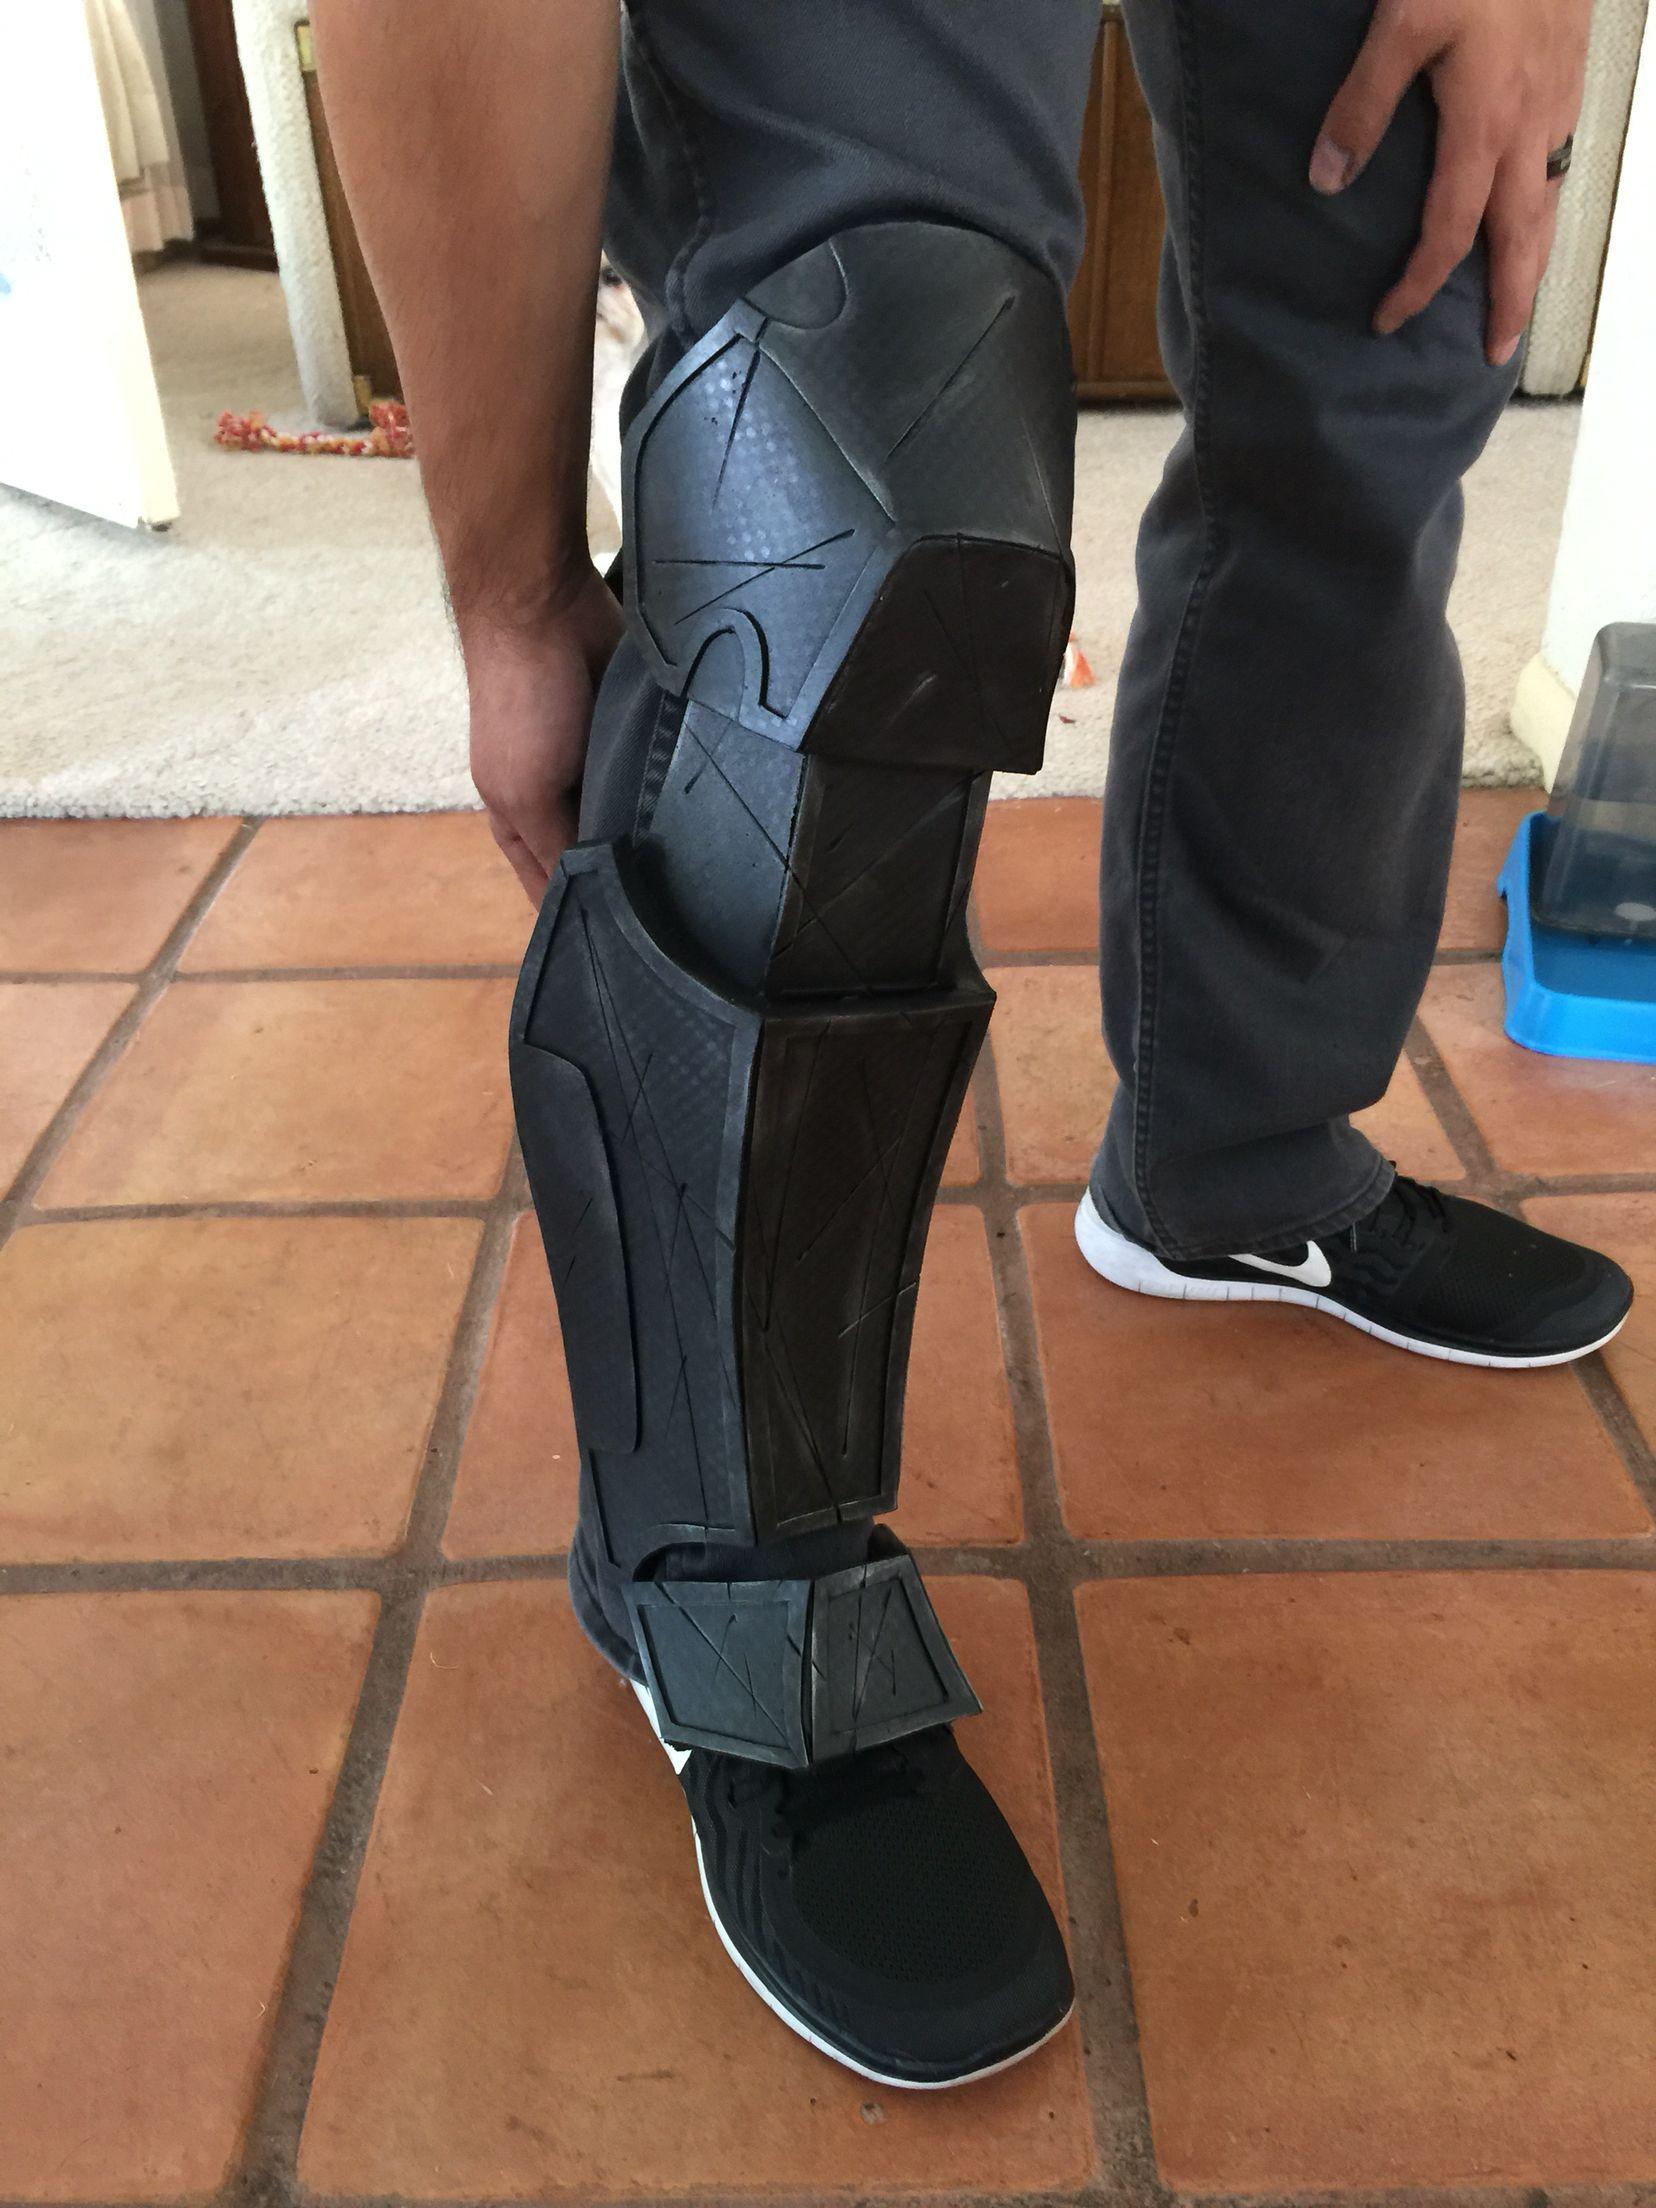 Batman arkham origins foam boot cover airbrushes to give